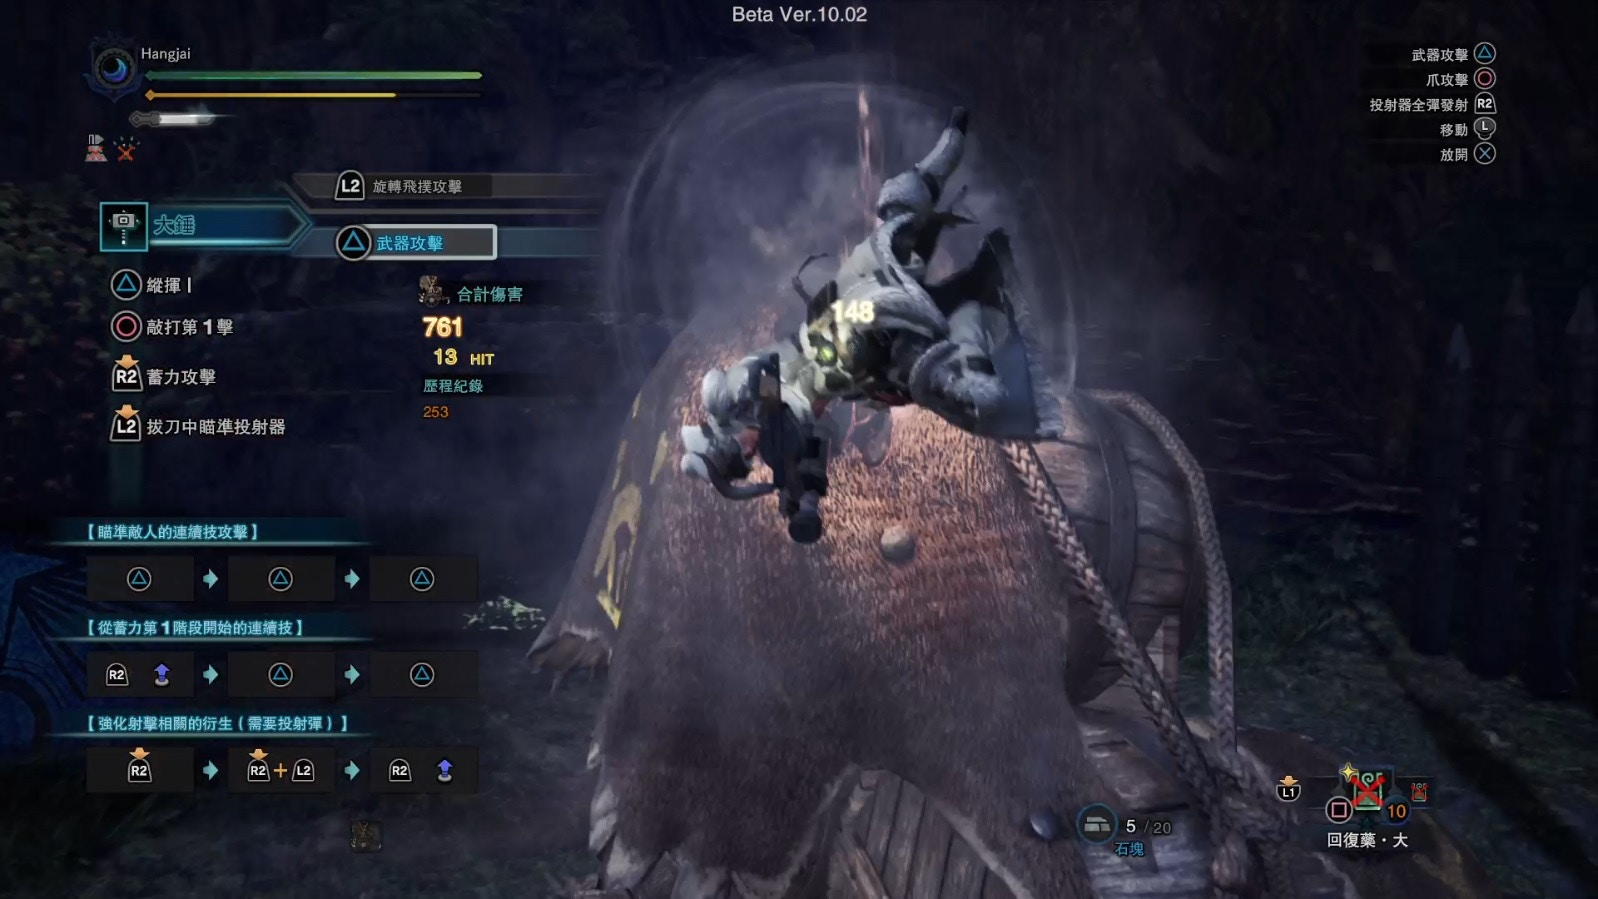 【MHW ICEBORNE】全武器新動作心得整理:盾斧,斬斧,鎚,蟲棍